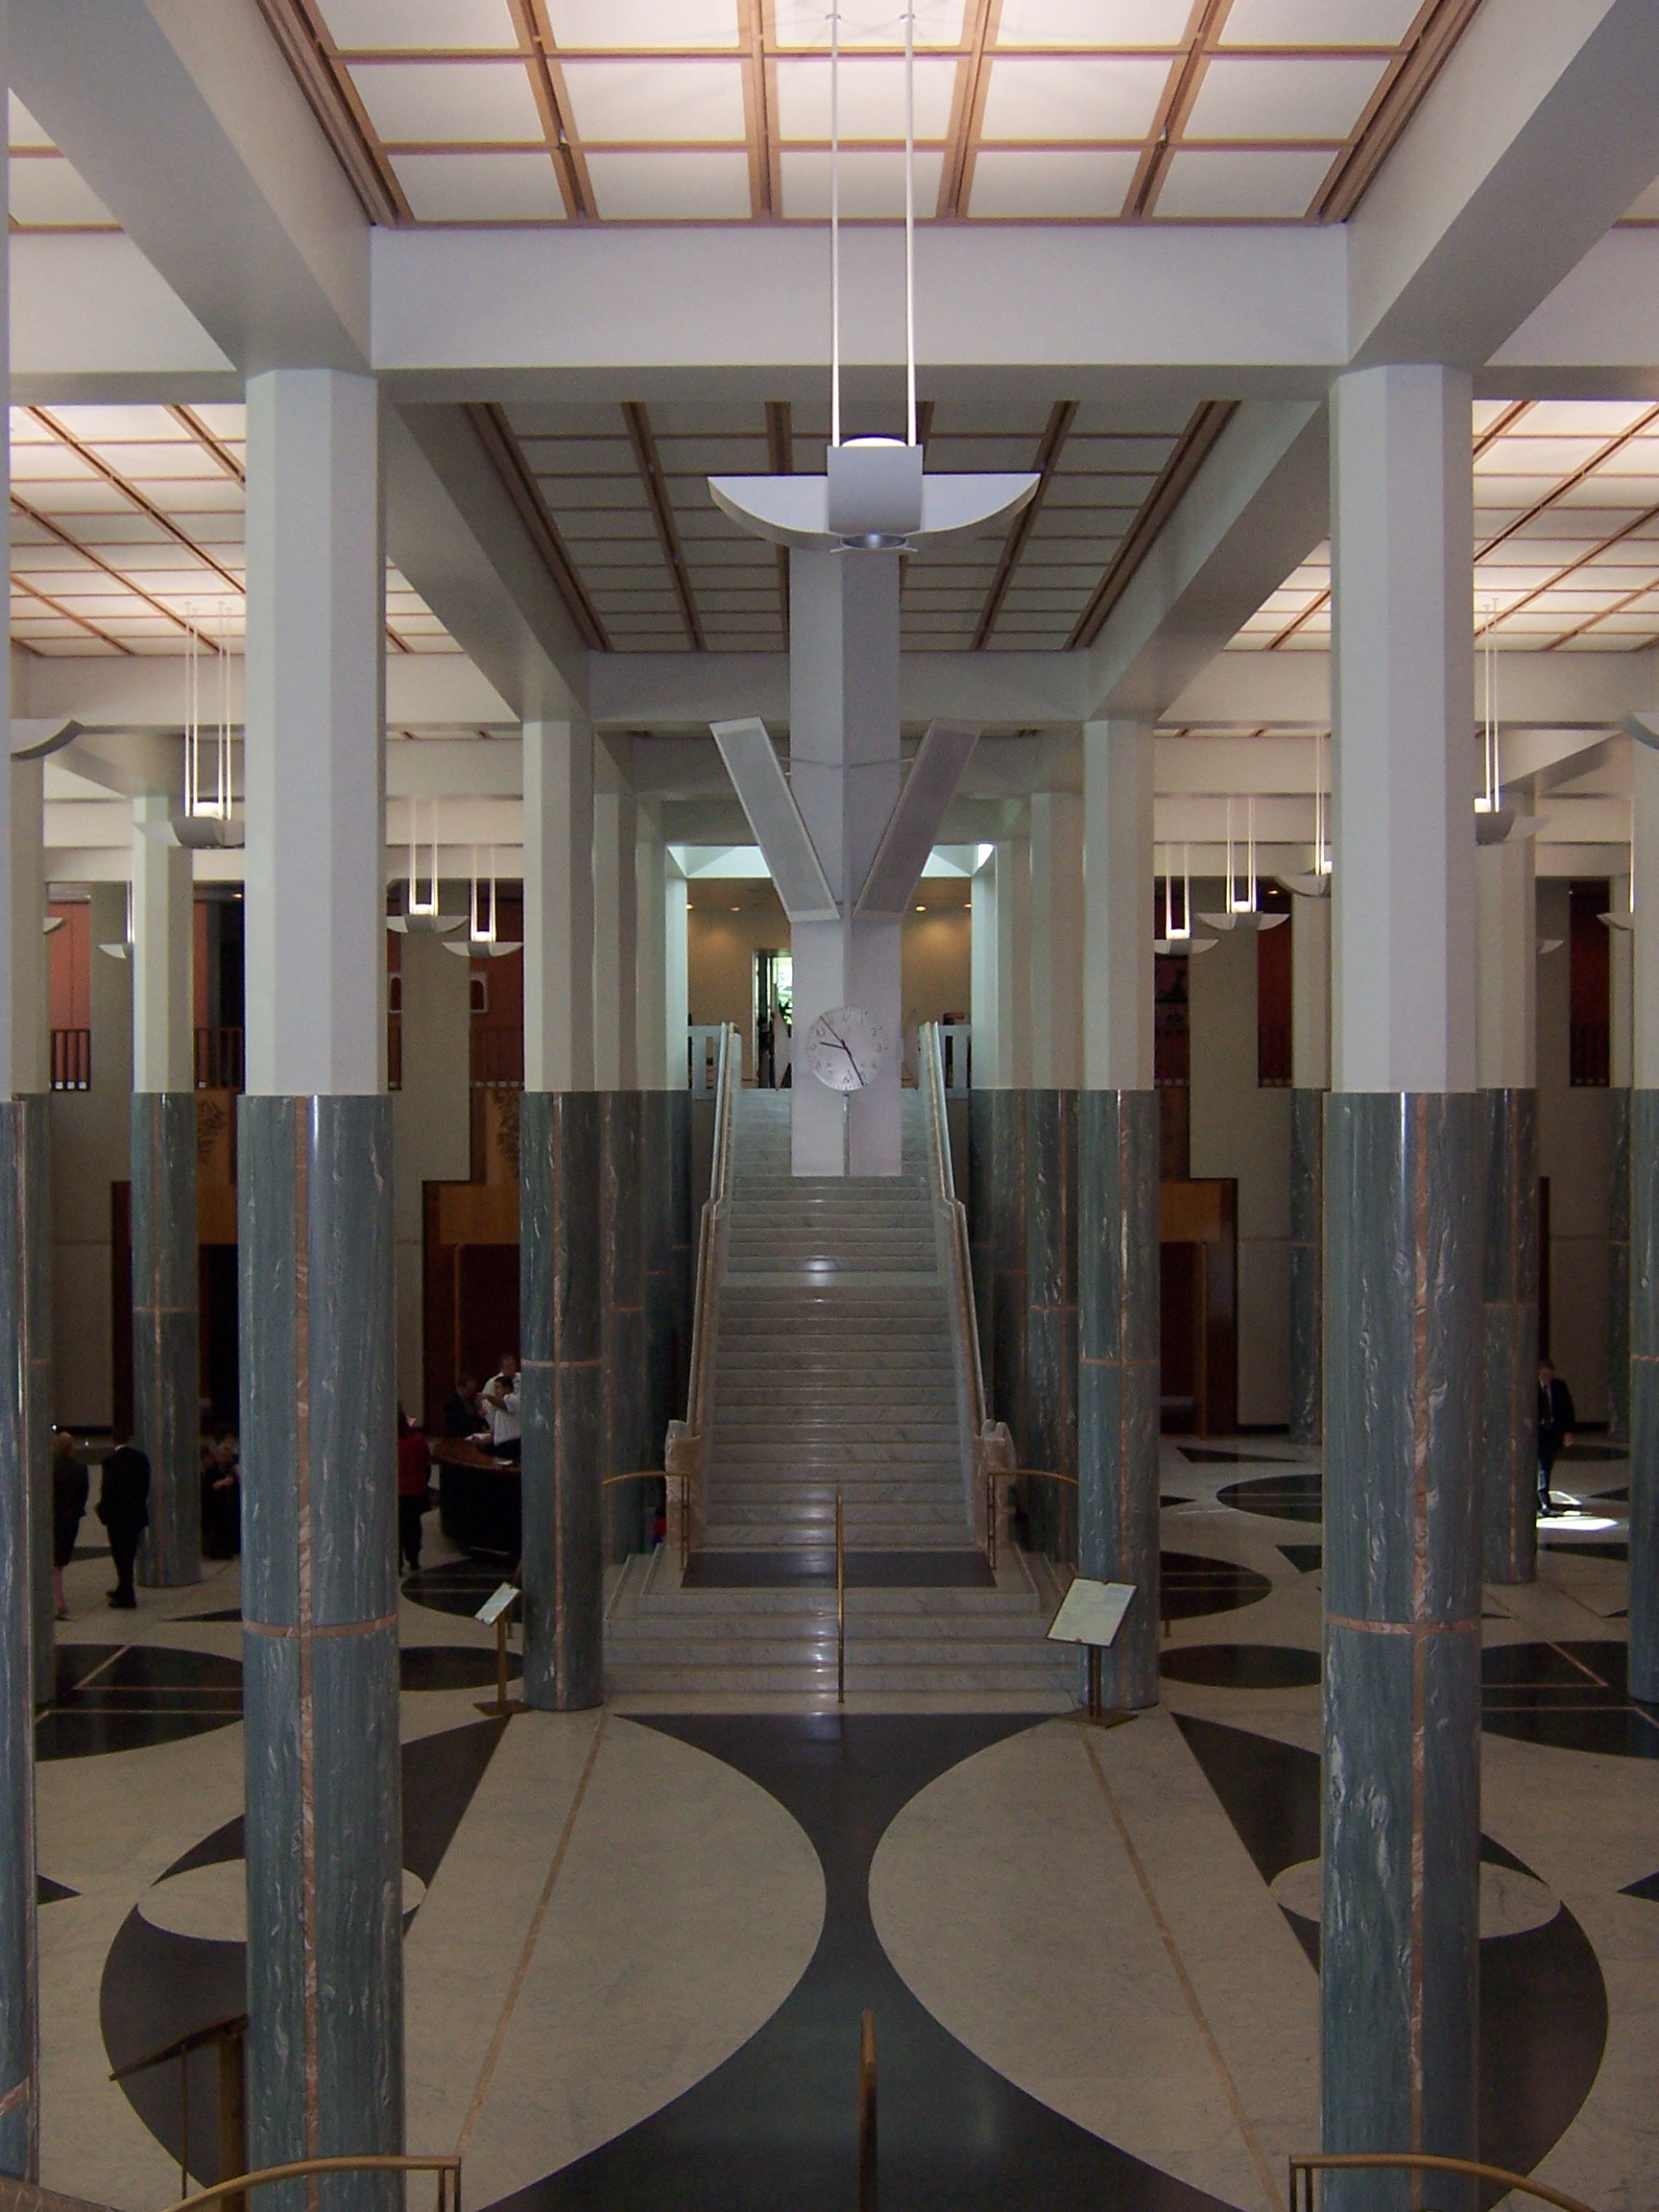 houses of parliament interior. File Parliament of australia interior jpg  Wikipedia